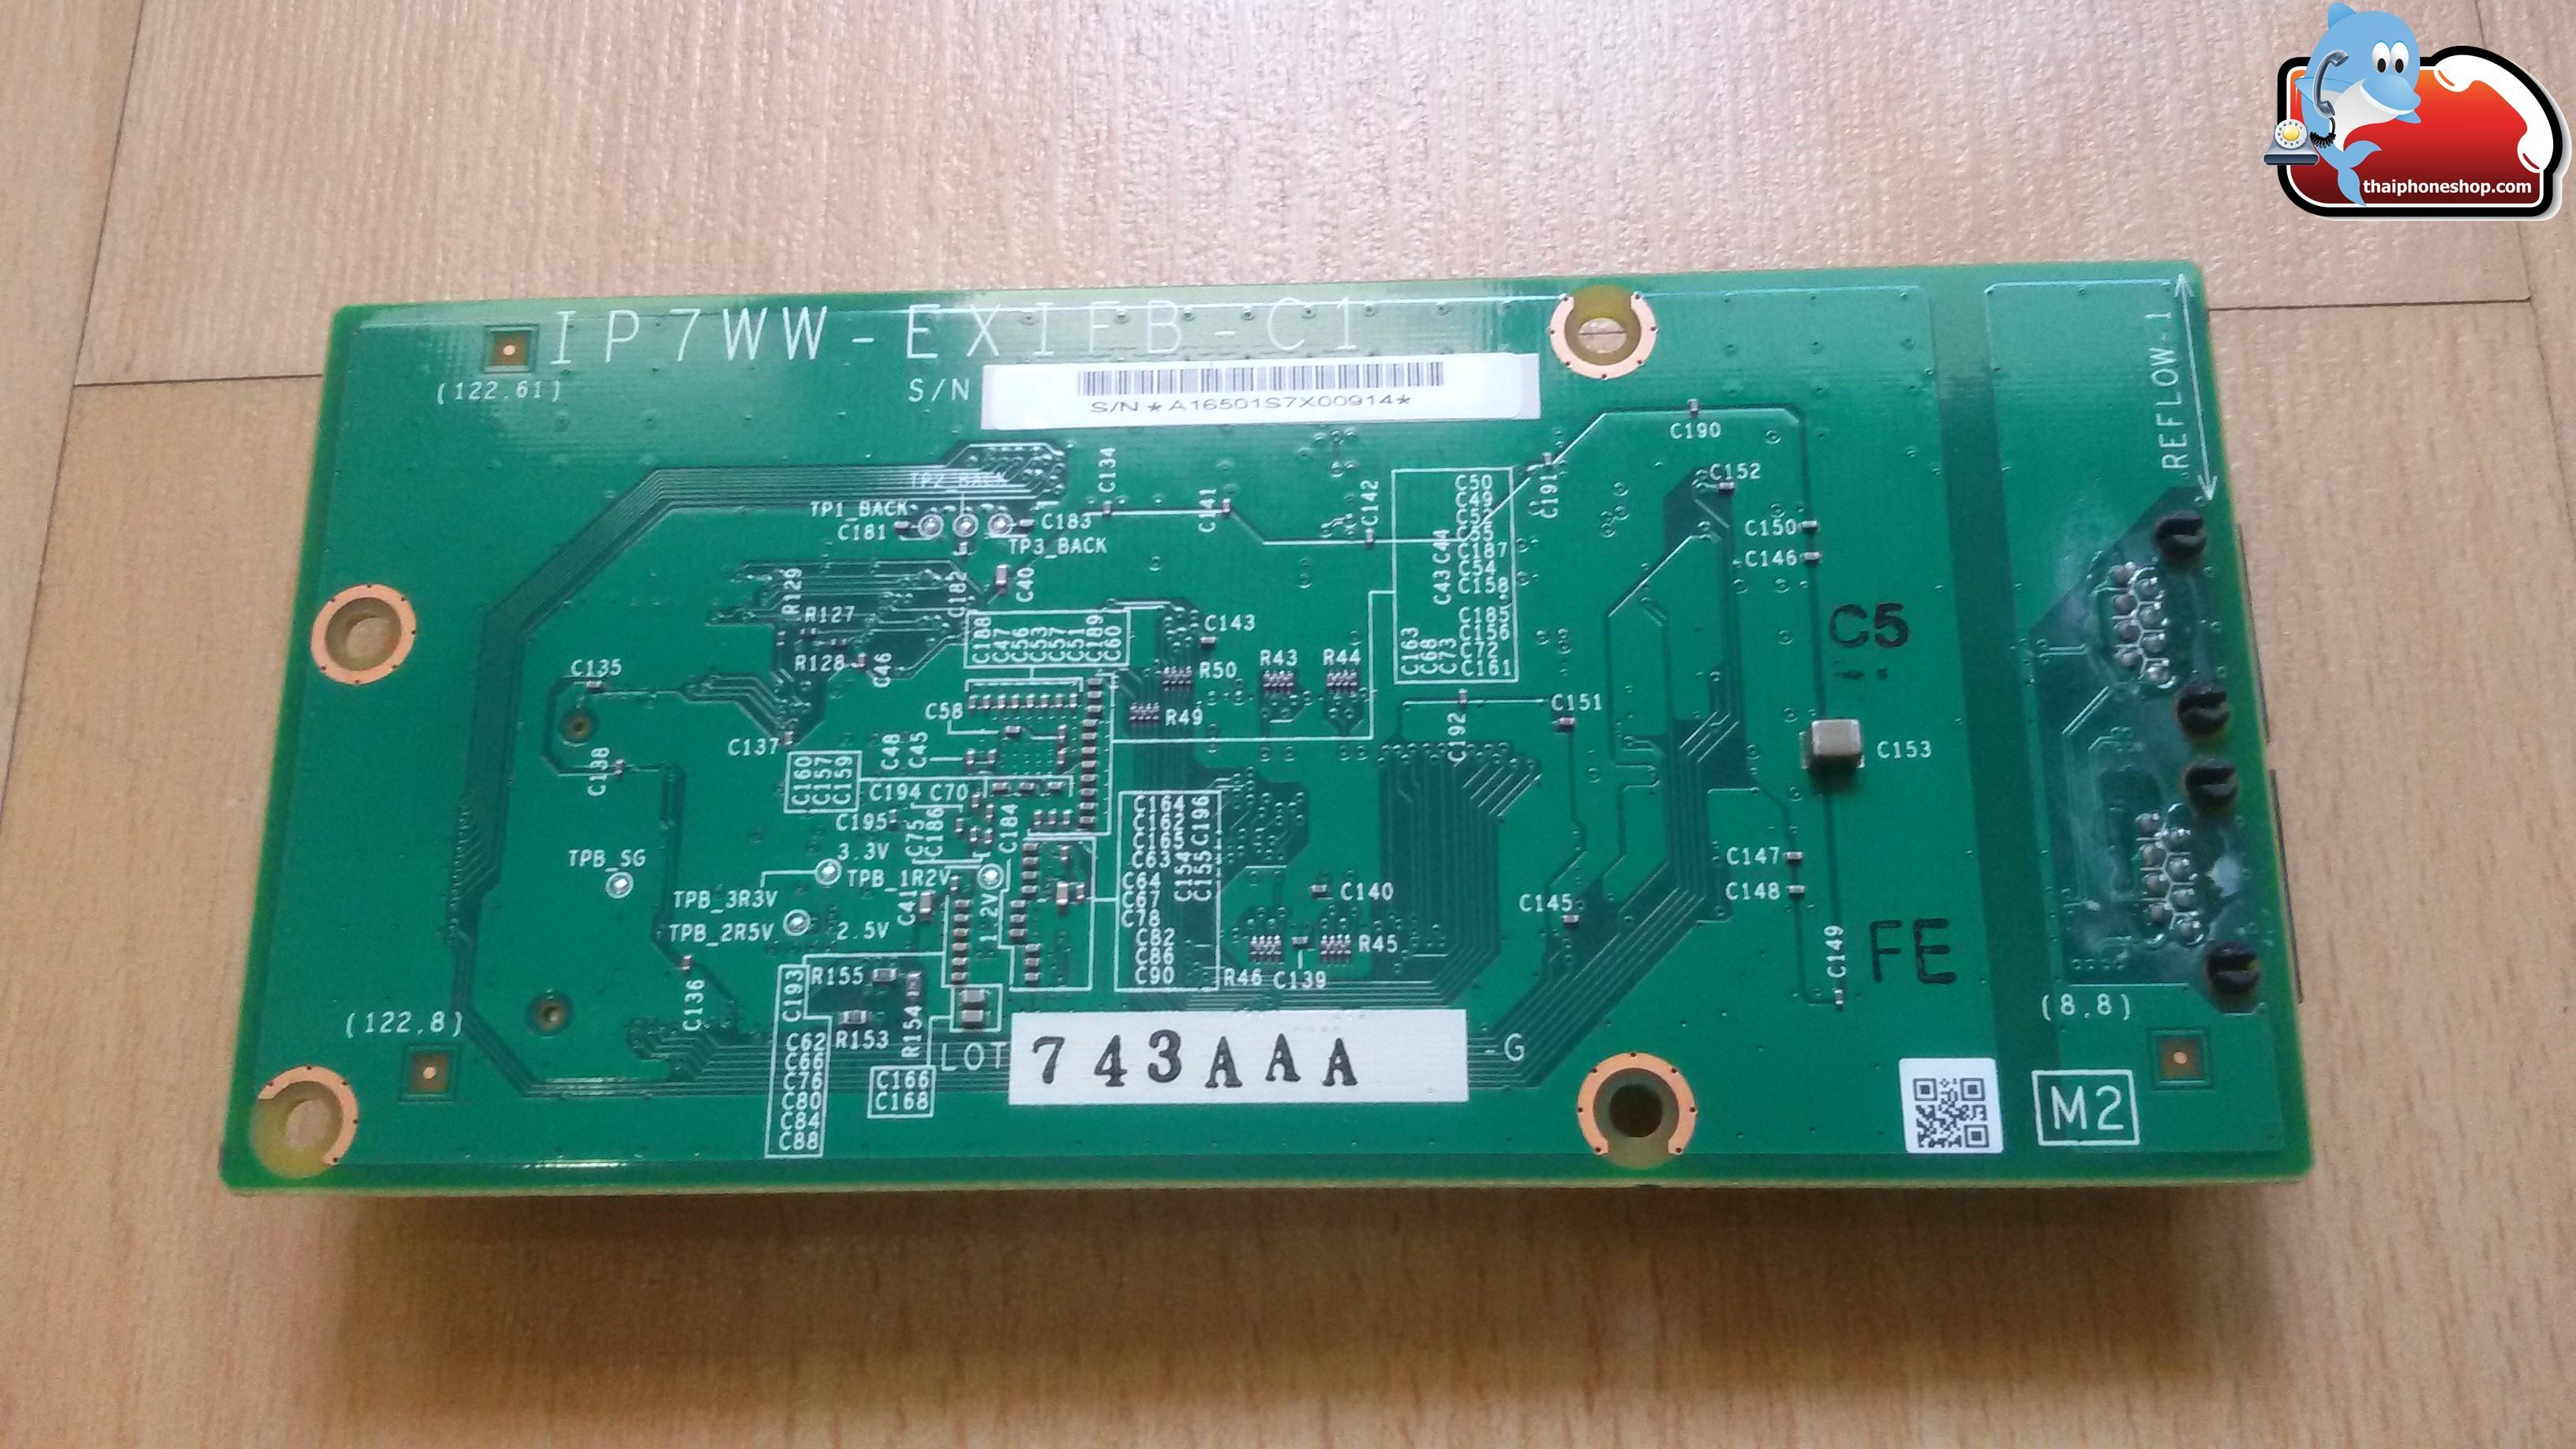 IP7WW-EXIFB-C1